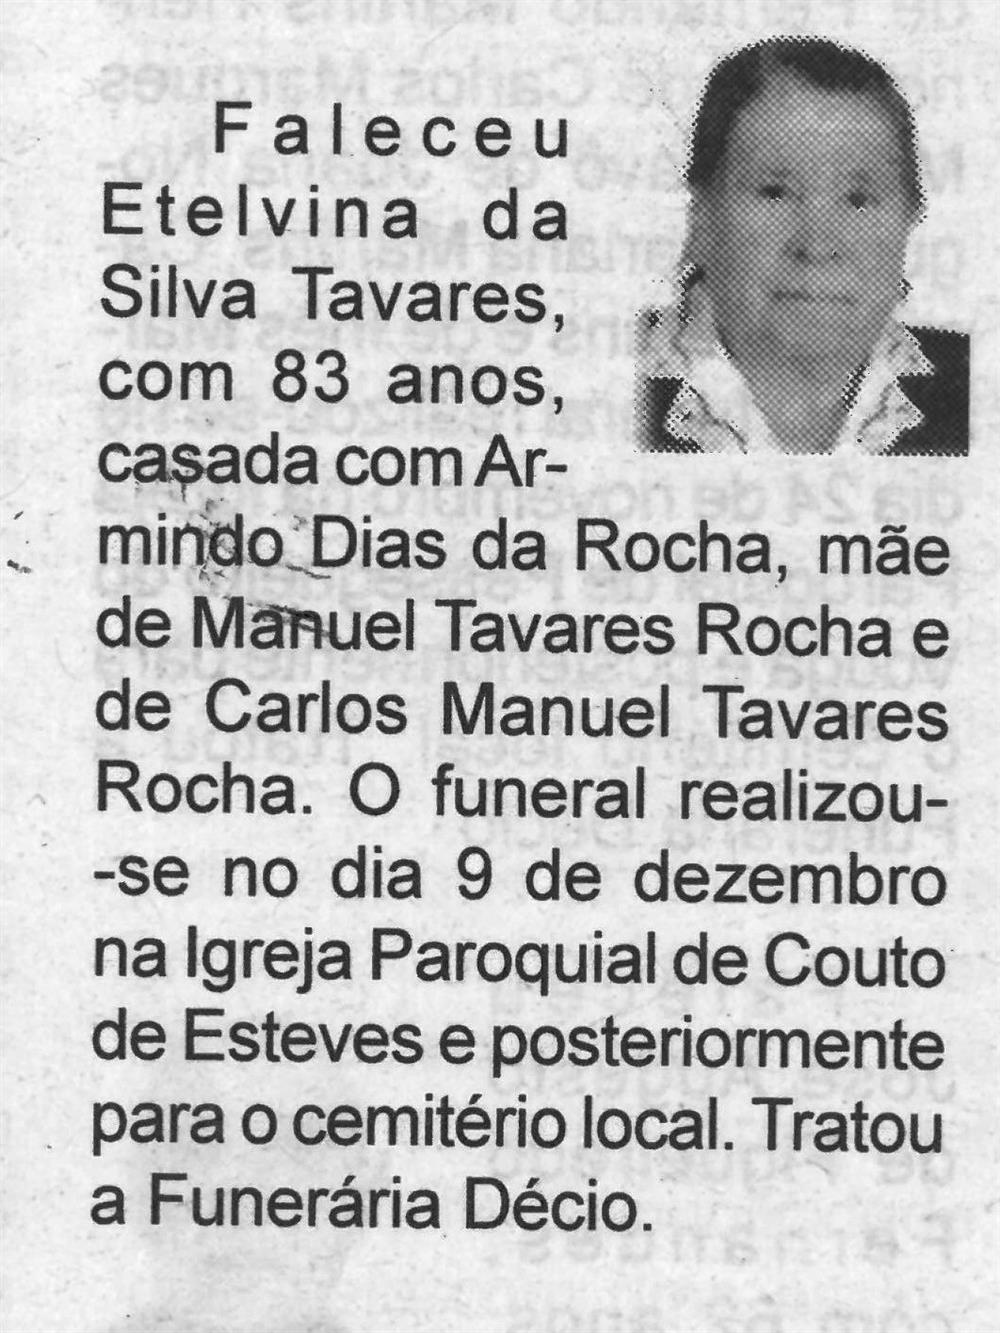 BV-2.ªdez.'20-p.14-Couto de Esteves : [Etelvina da Silva Tavares].jpg